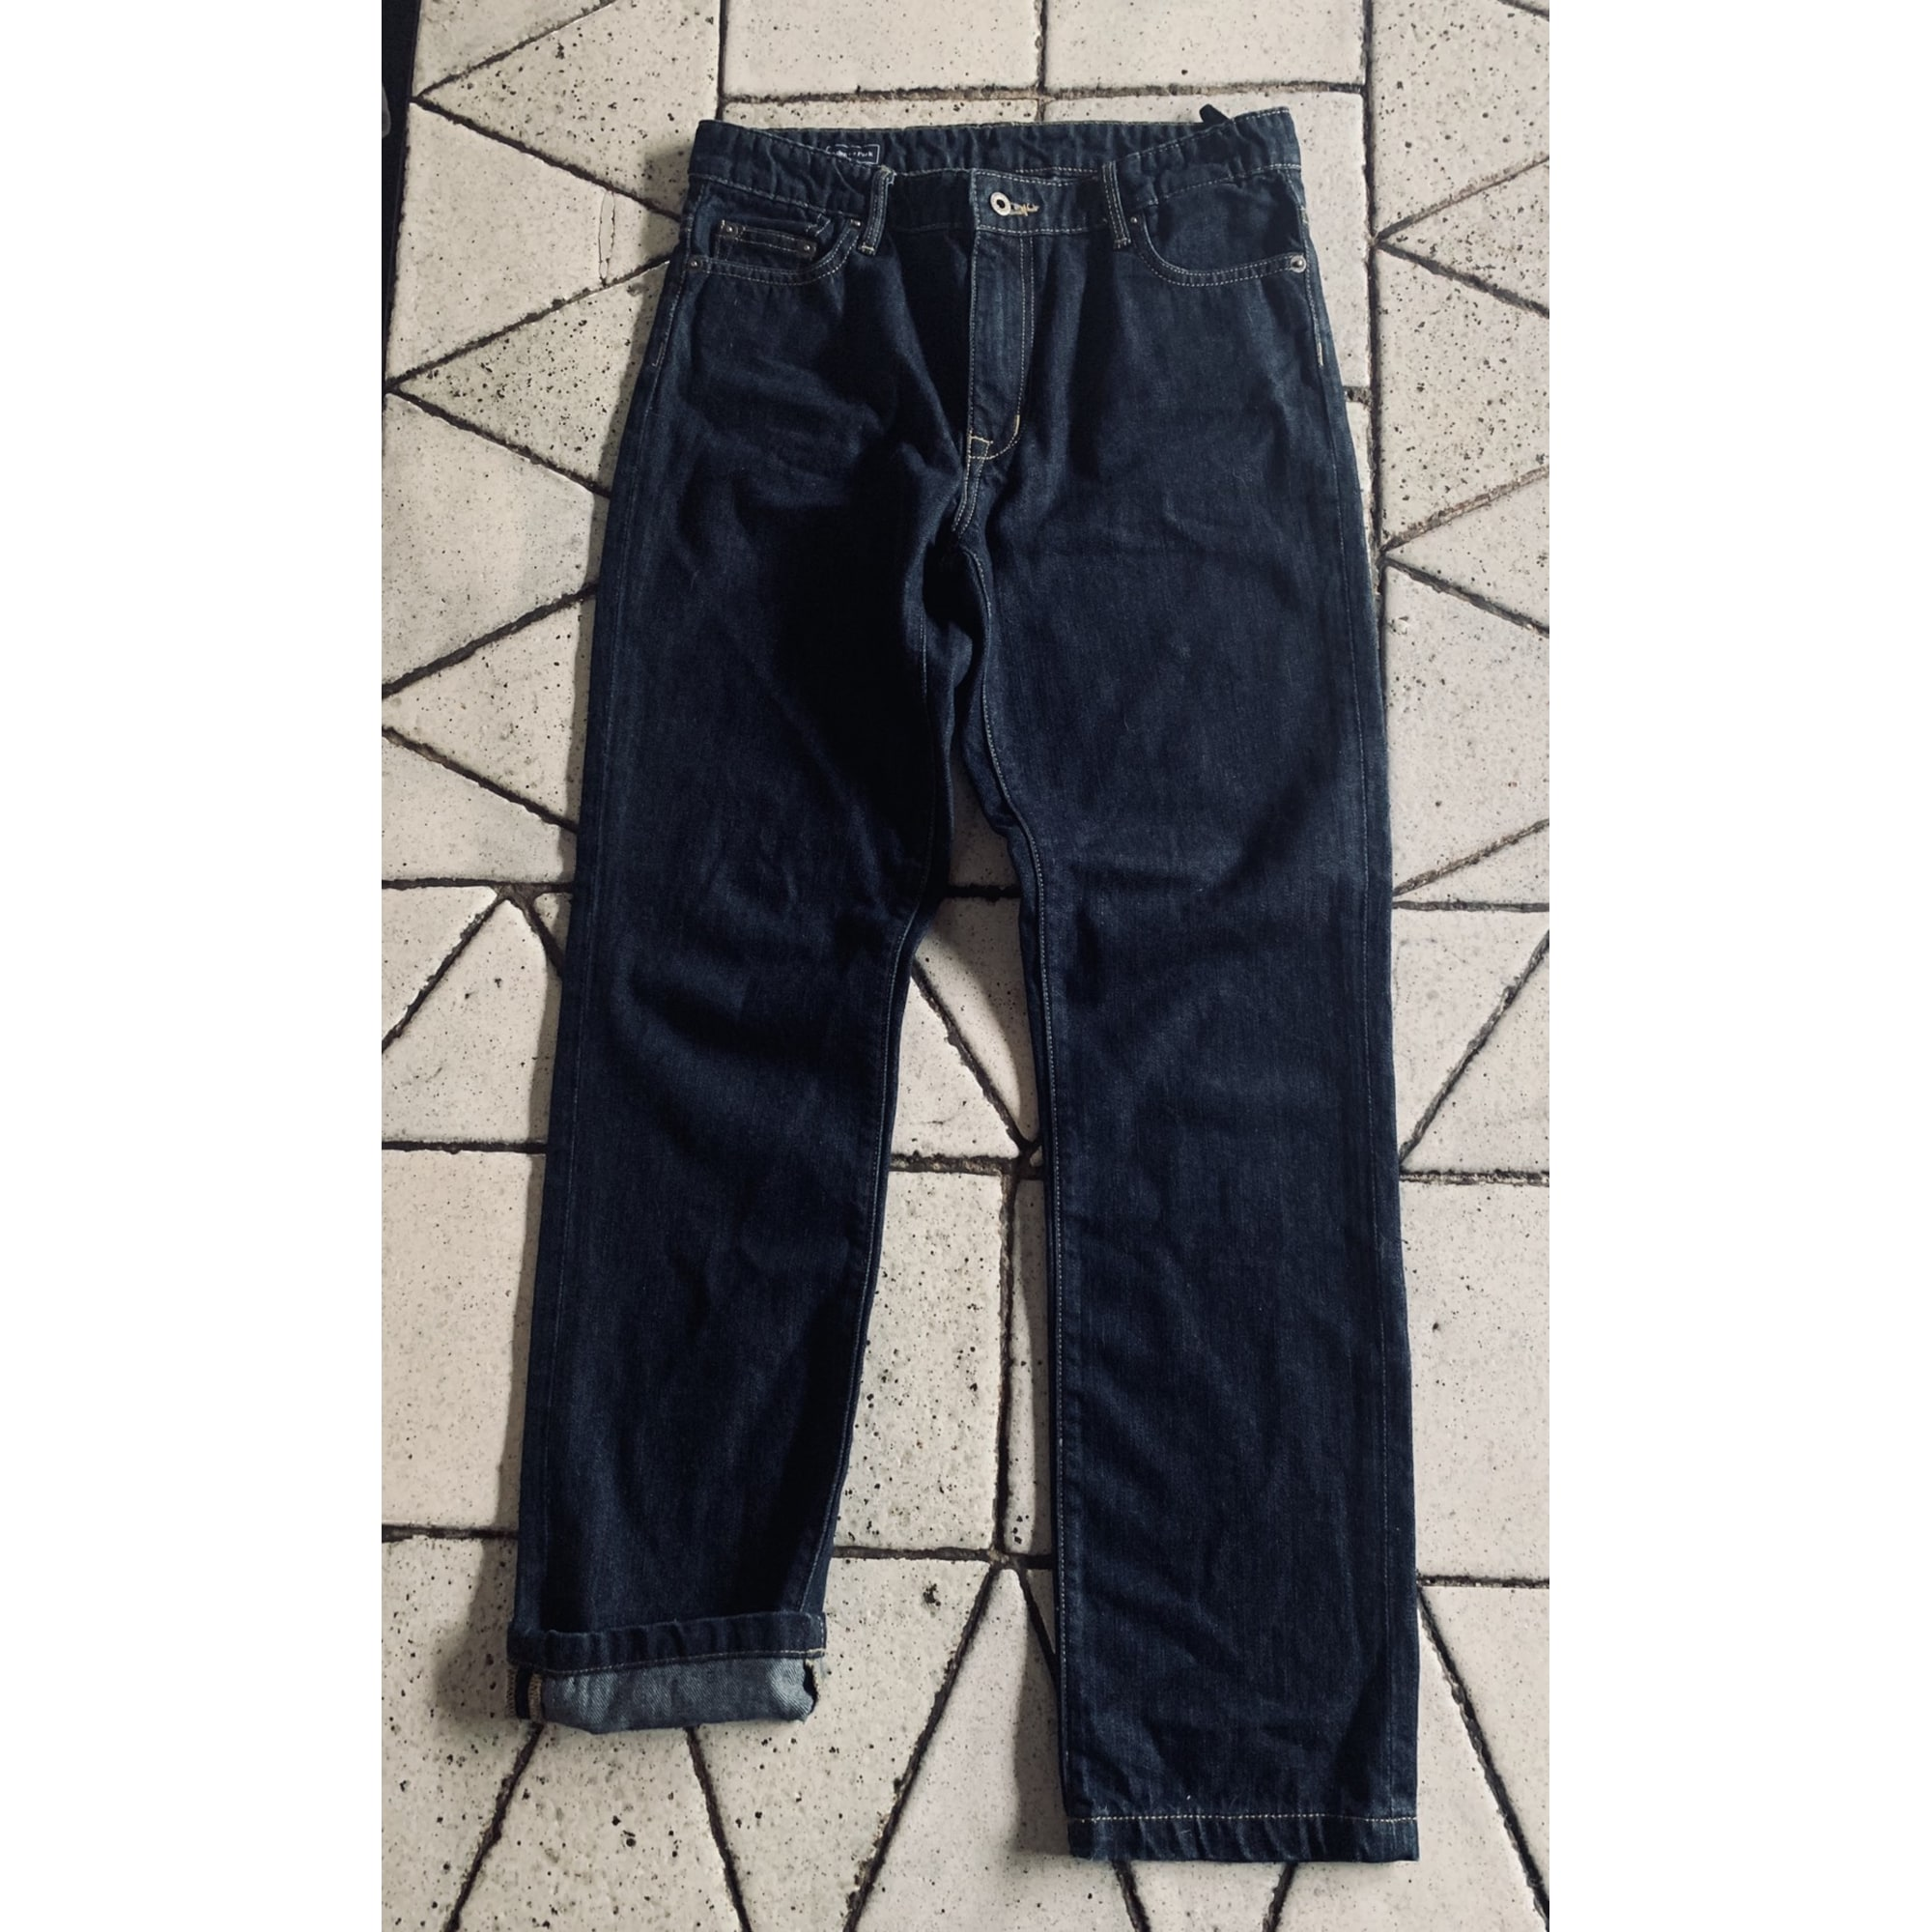 Jeans droit EDEN PARK Bleu, bleu marine, bleu turquoise